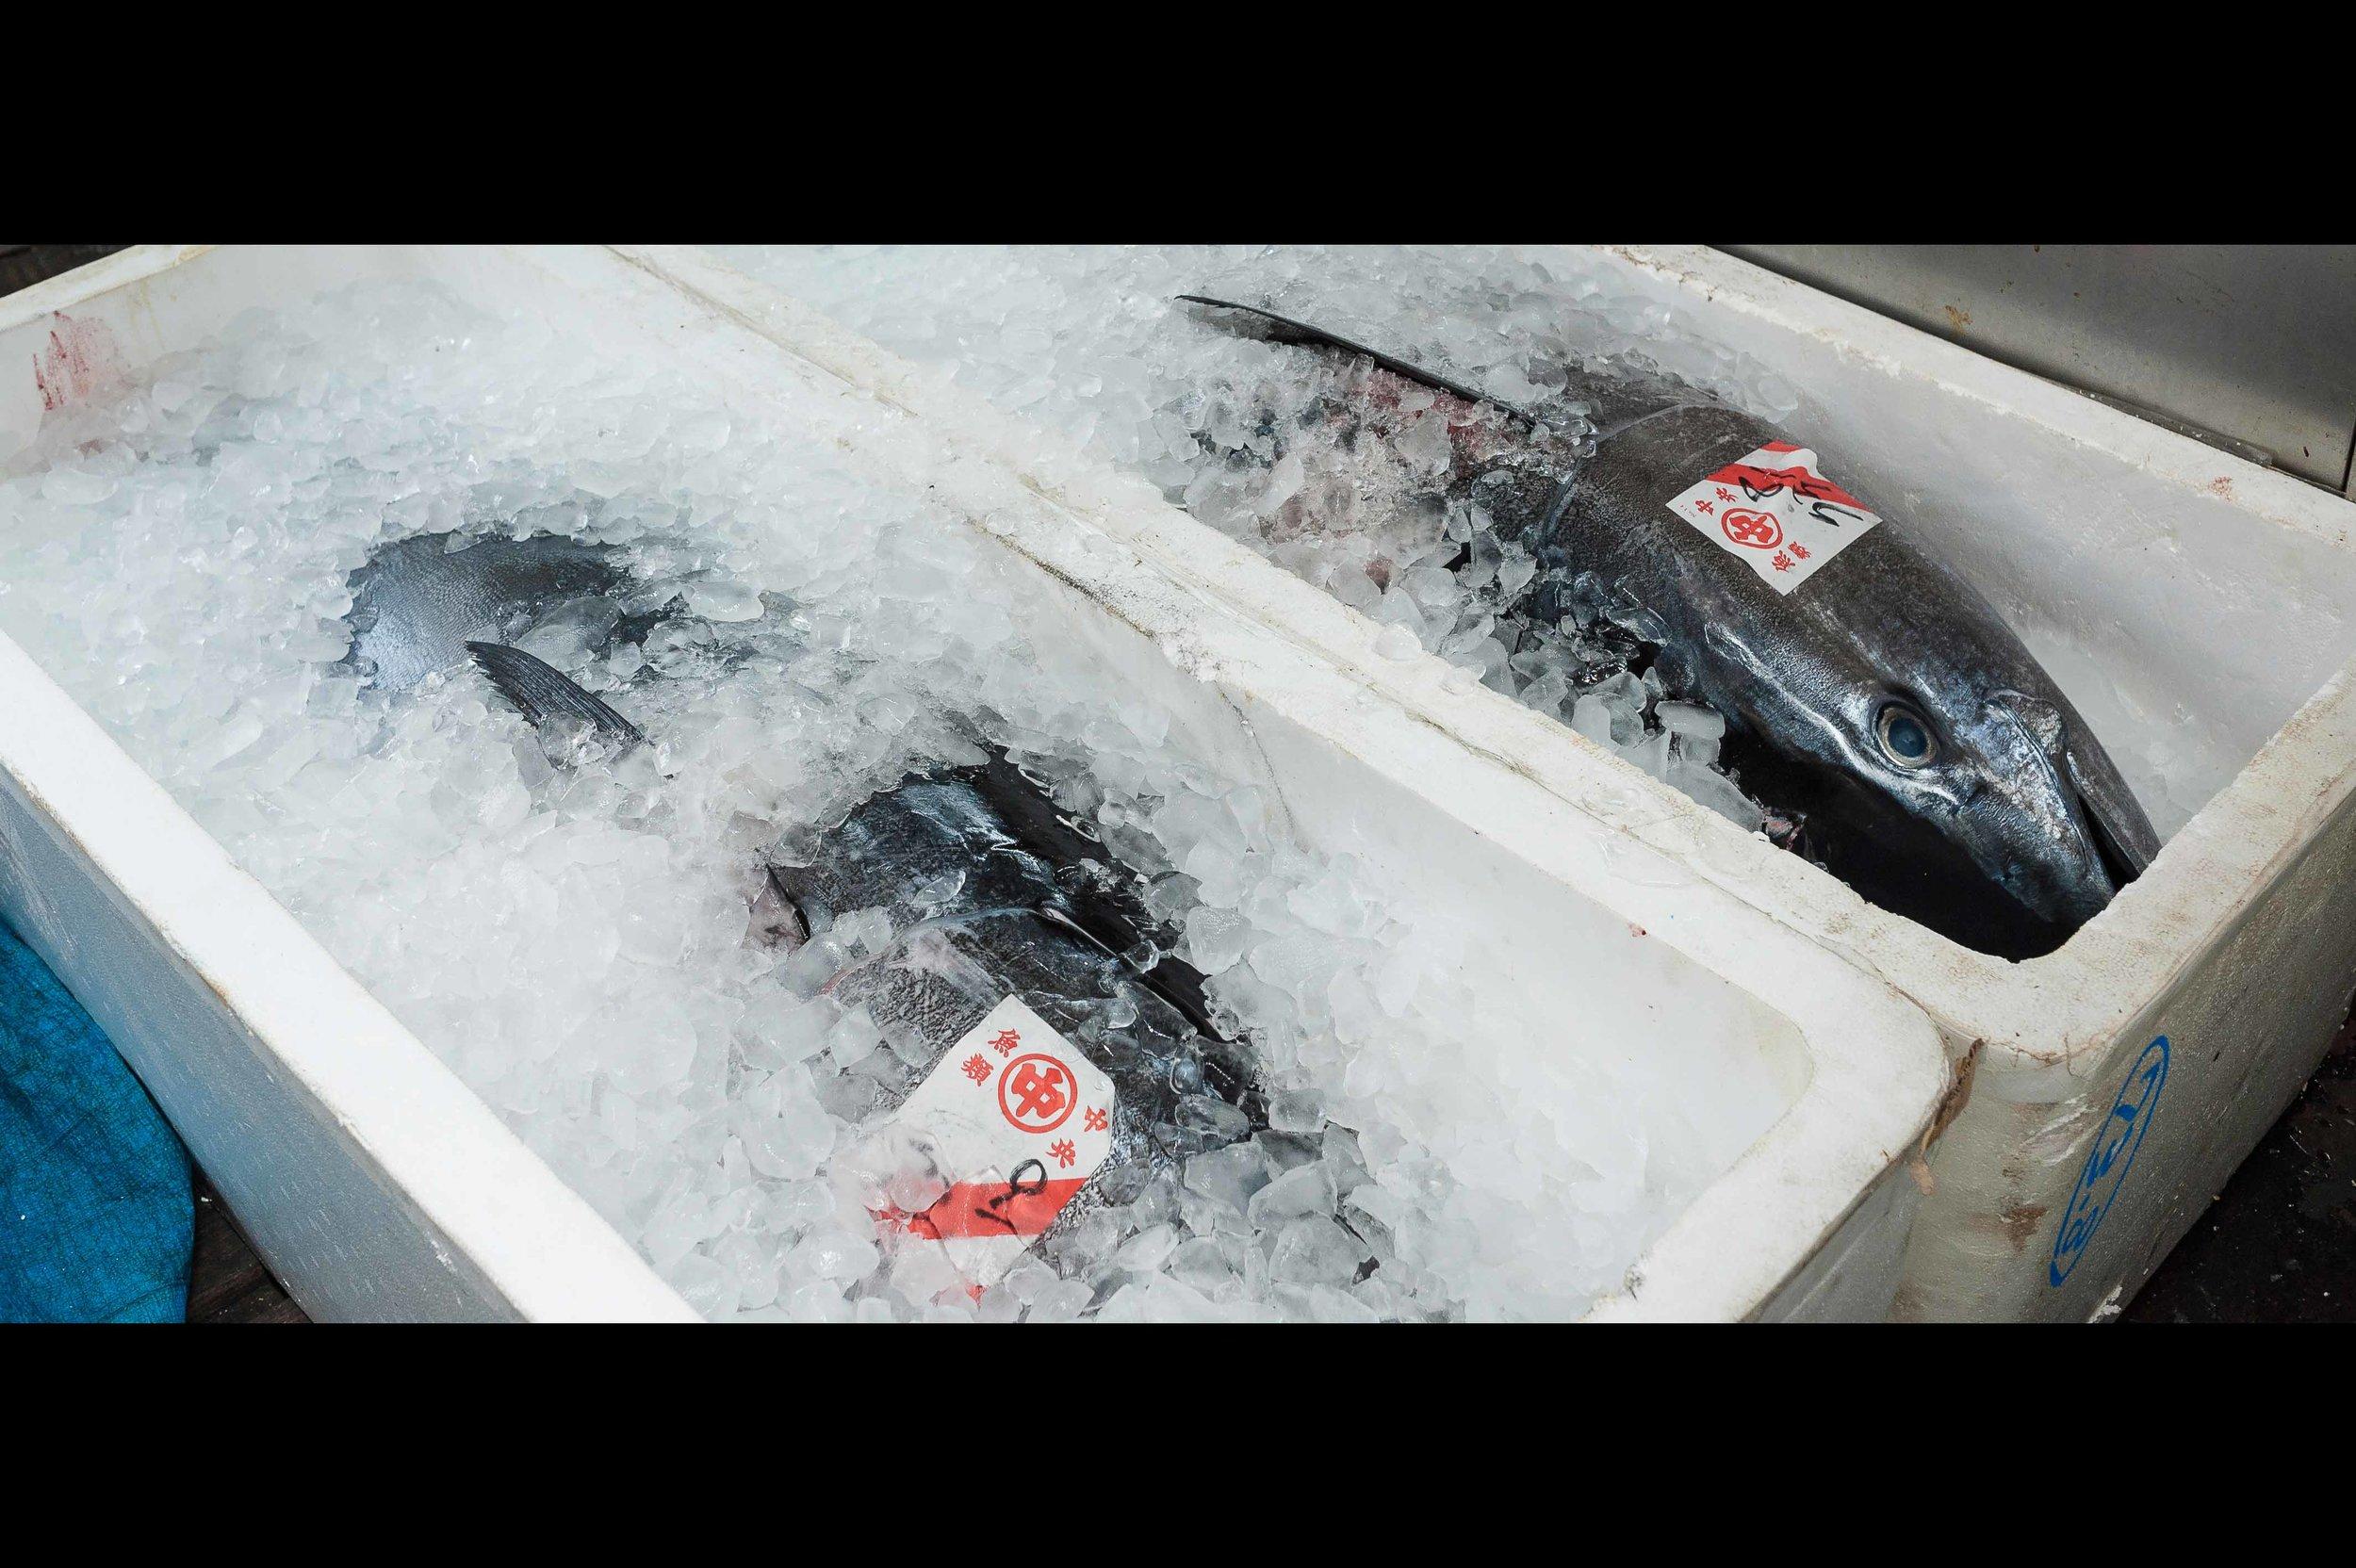 tokyo-fish-market-tuna-auction.jpg